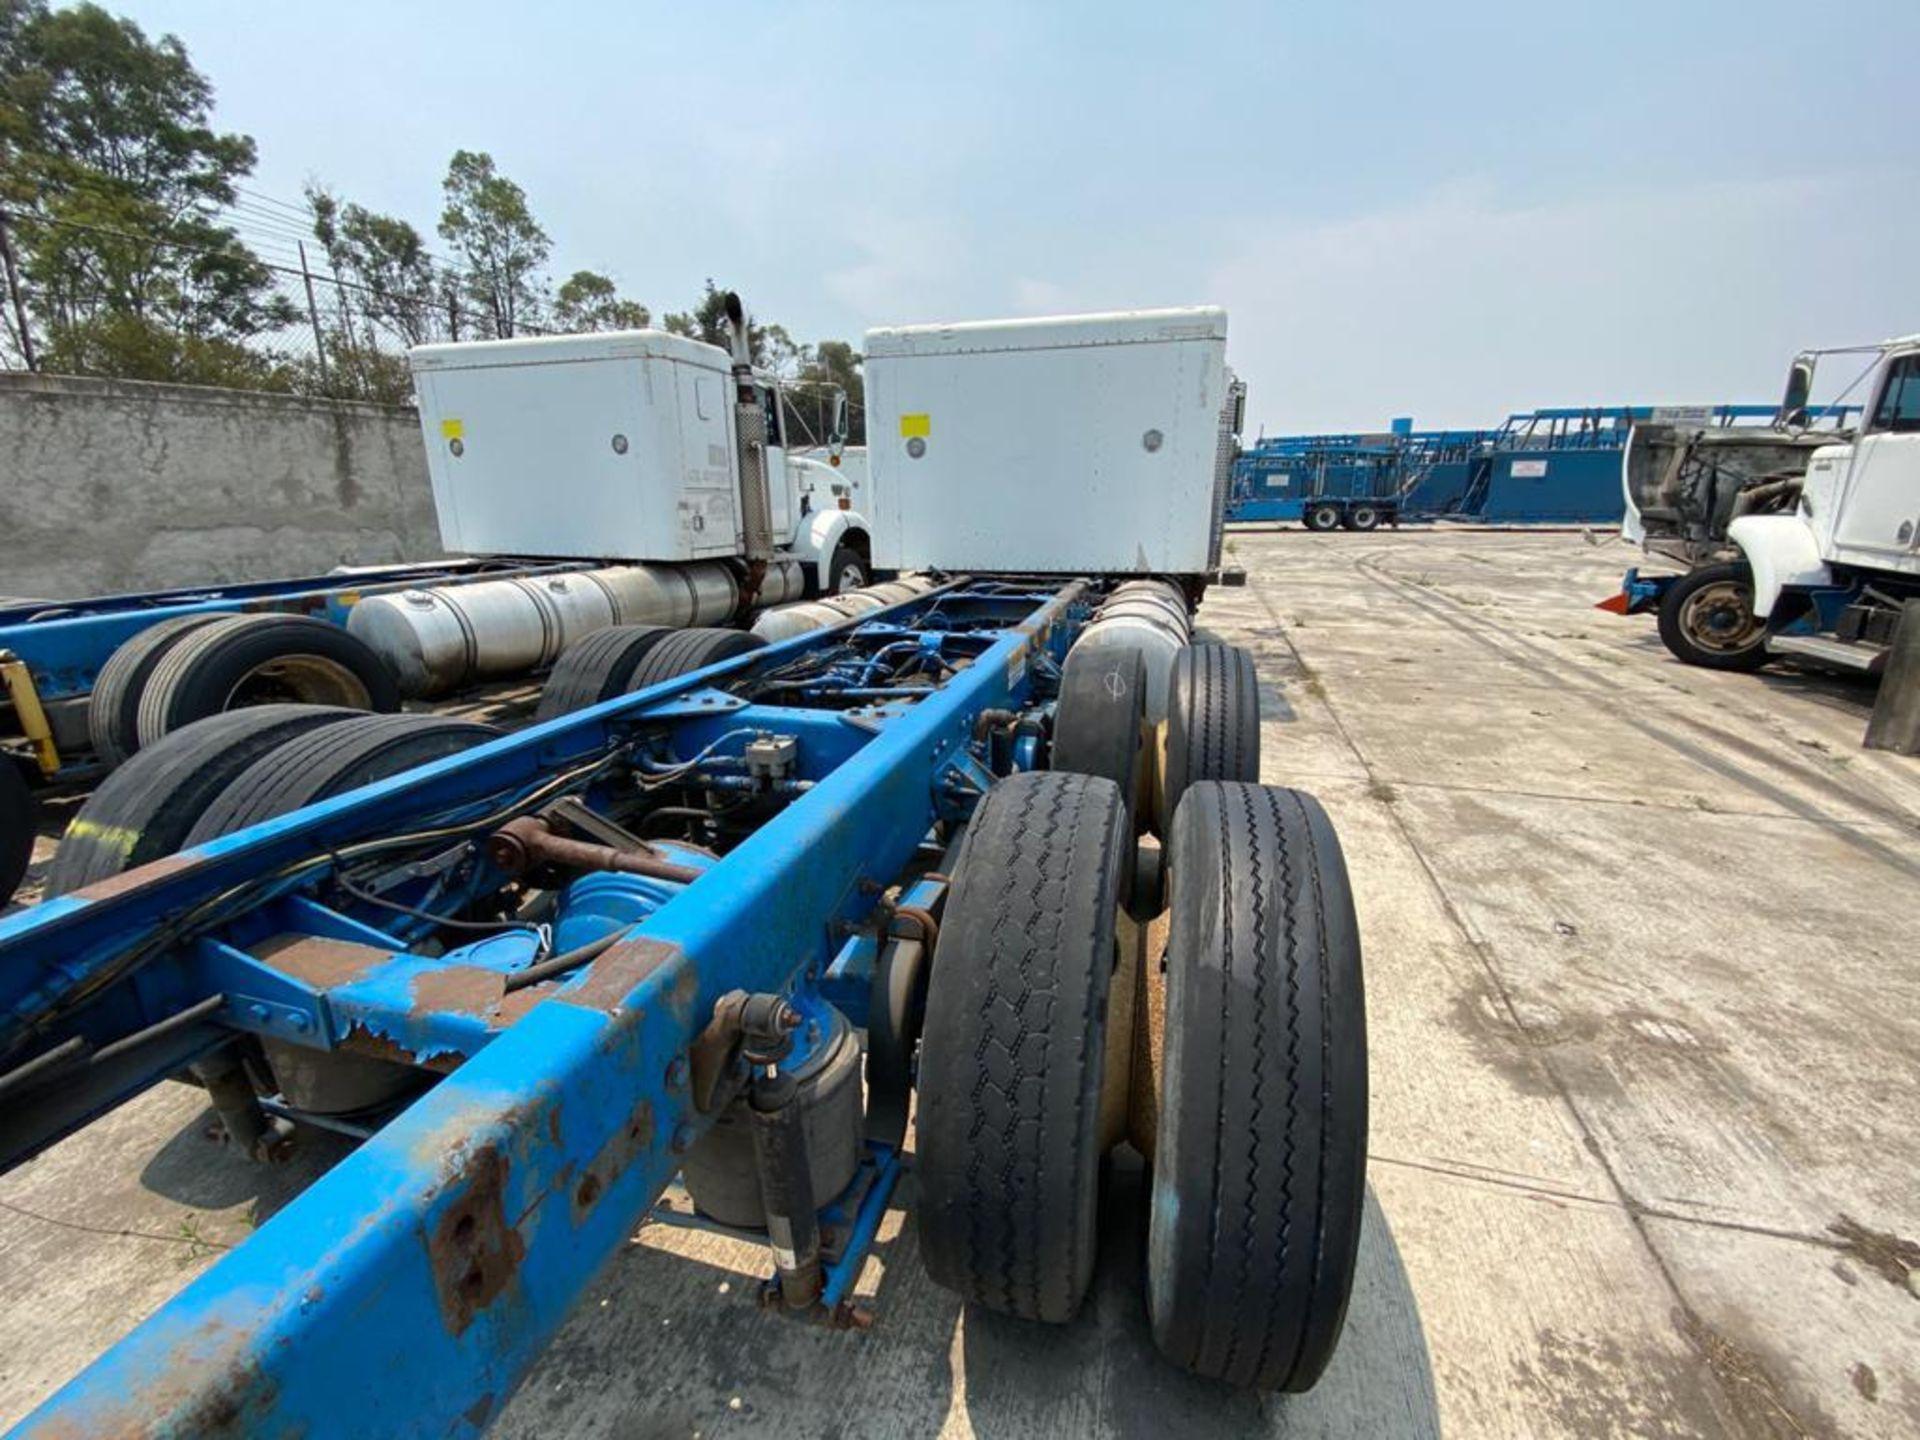 1999 Kenworth Sleeper truck tractor, standard transmission of 18 speeds - Image 22 of 70